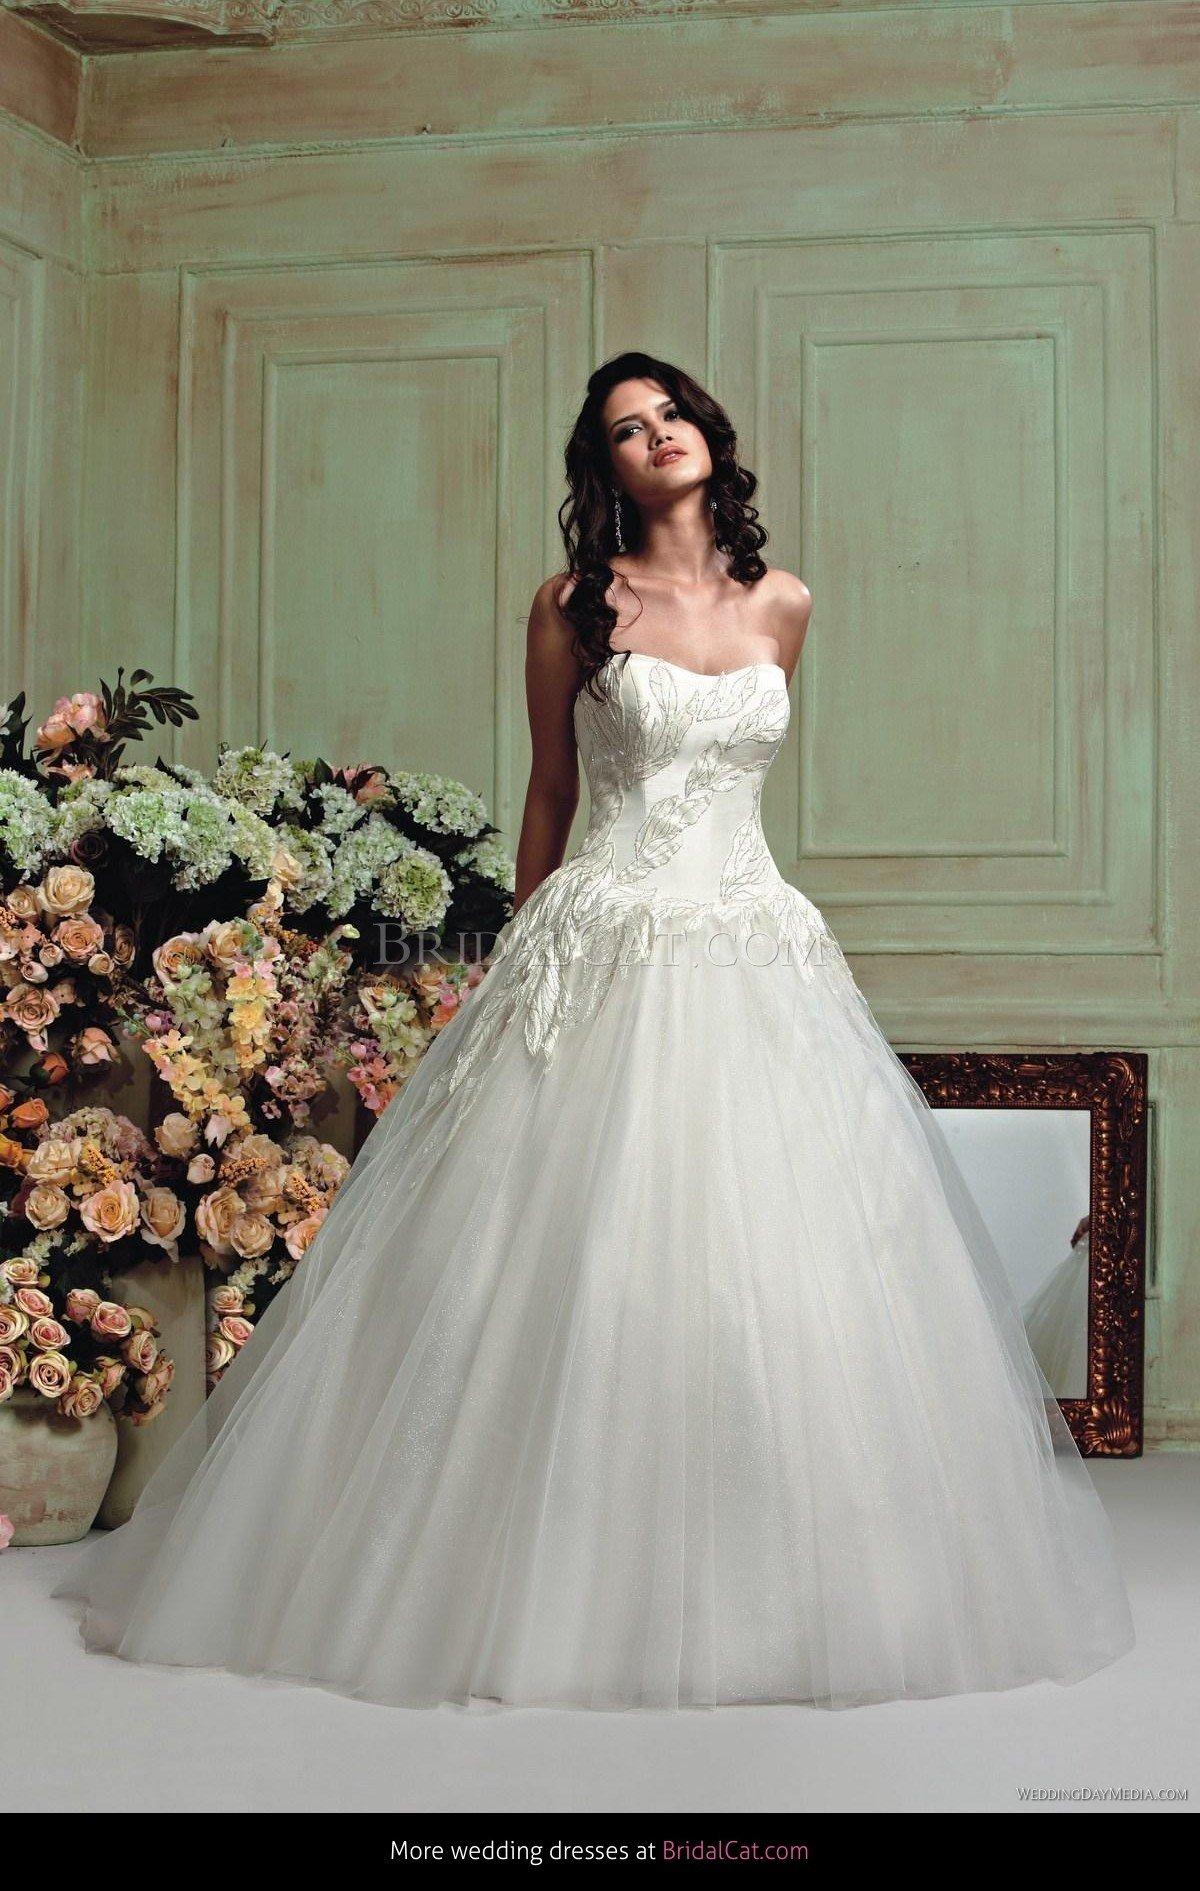 New veromia wedding dresses 169247vr61323 2 04aruba895 09d67ce4b5 1 ad1ebde212 veromia style vr61257 ombrellifo Choice Image